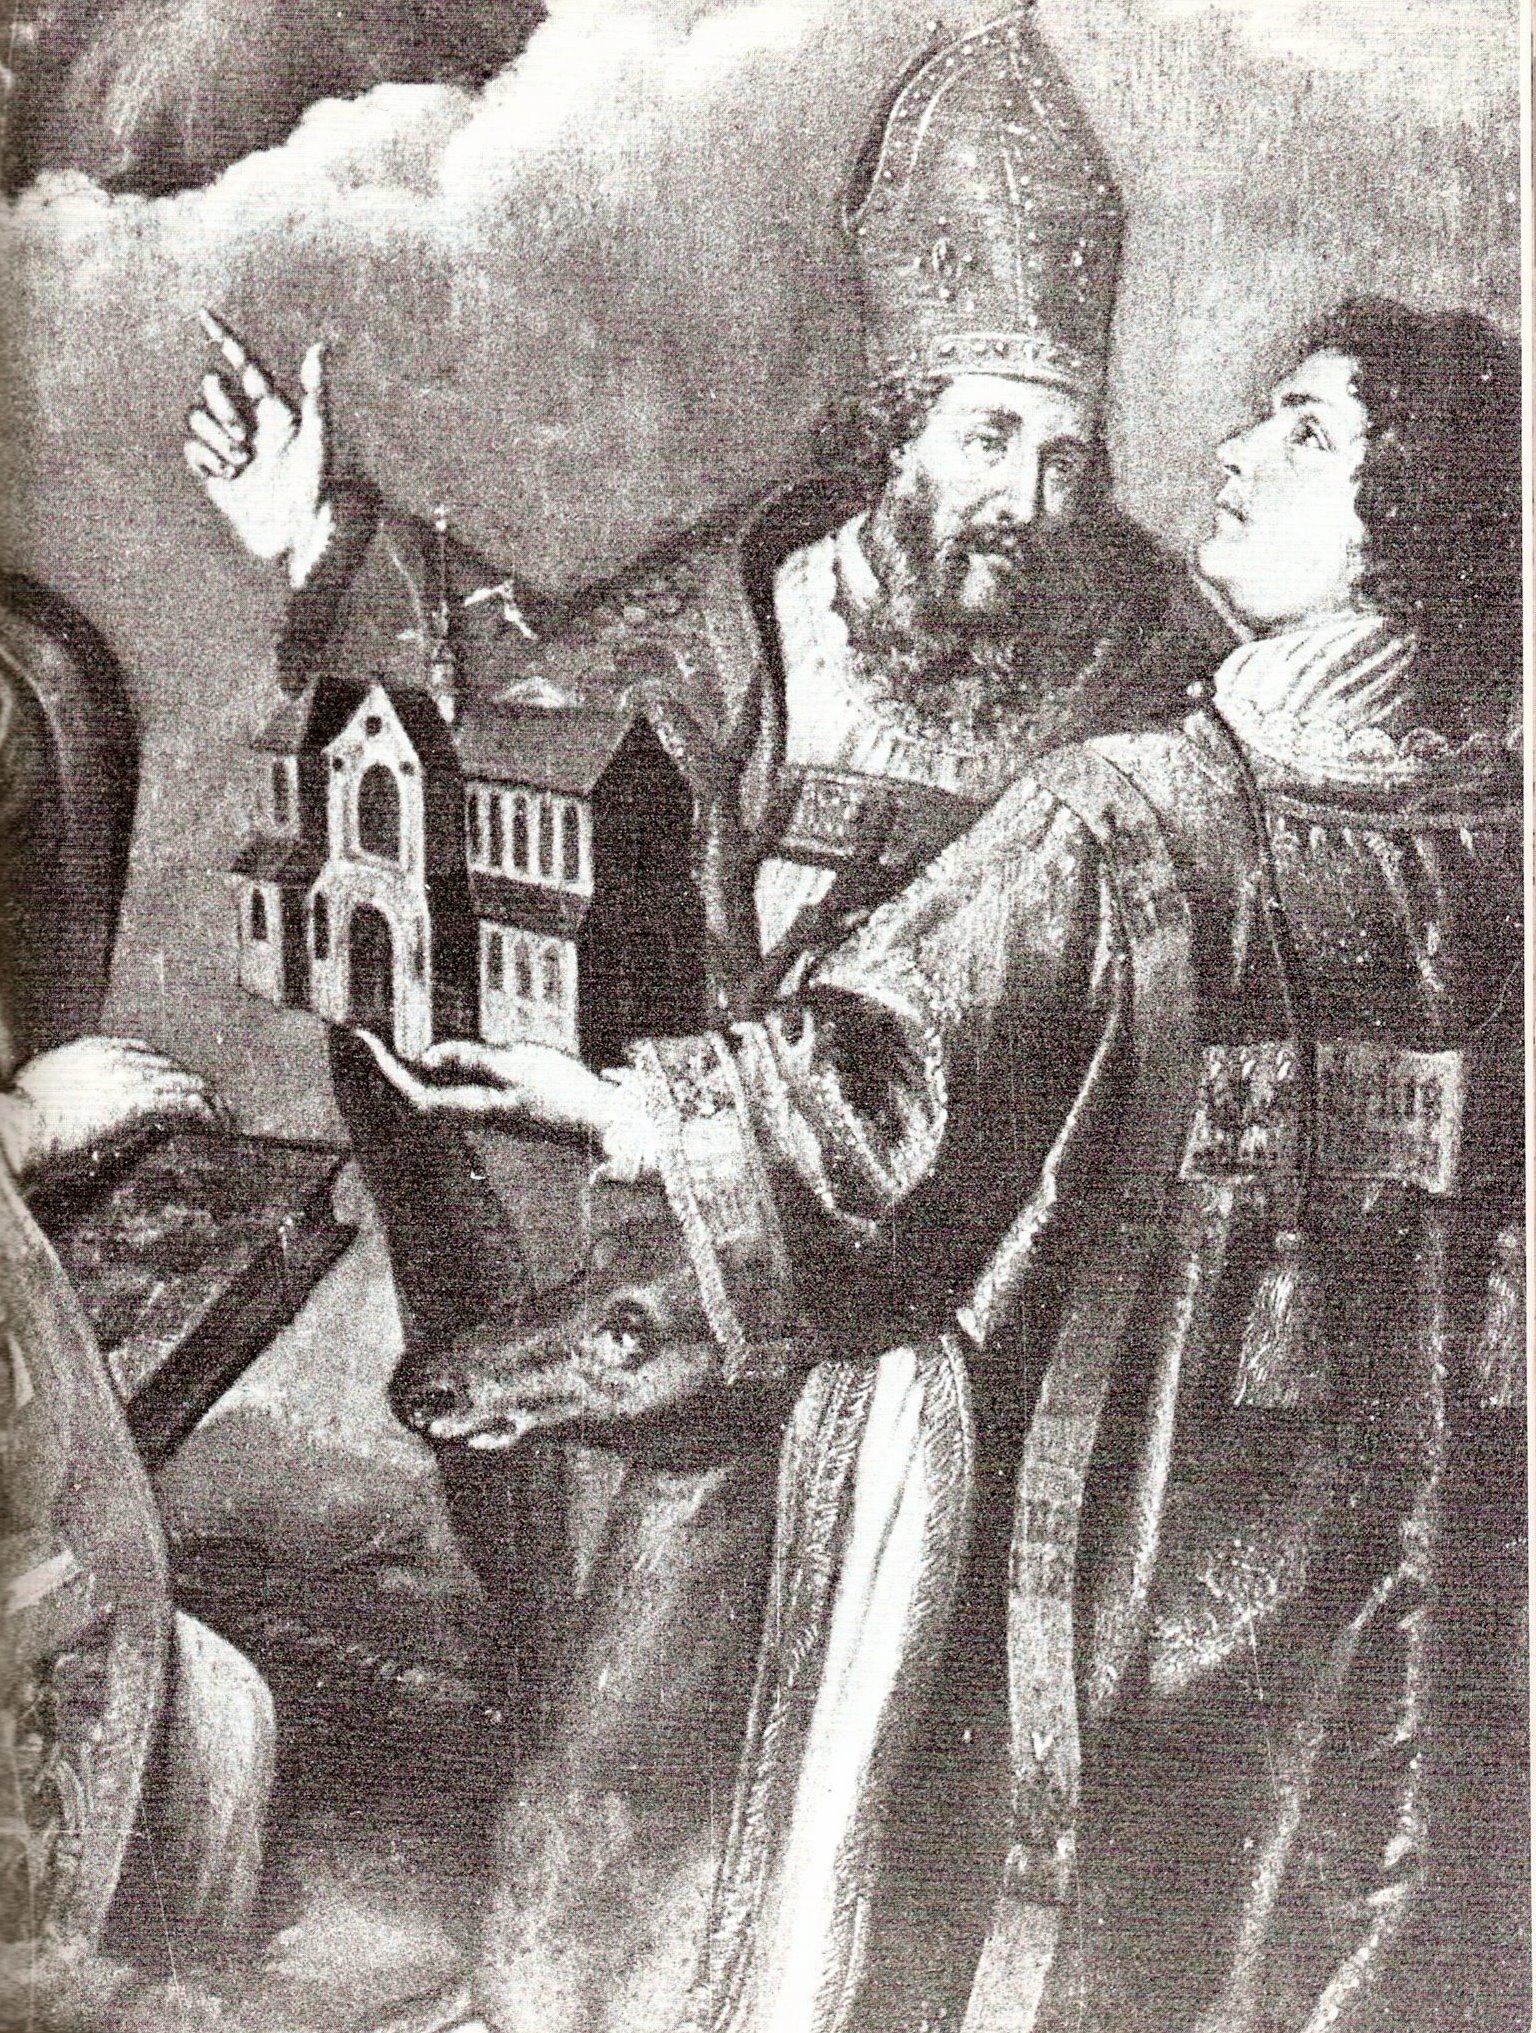 Historienmalerei  File:FBPB 29 Bischof Badurad 815 Barocke Historienmalerei.jpg ...